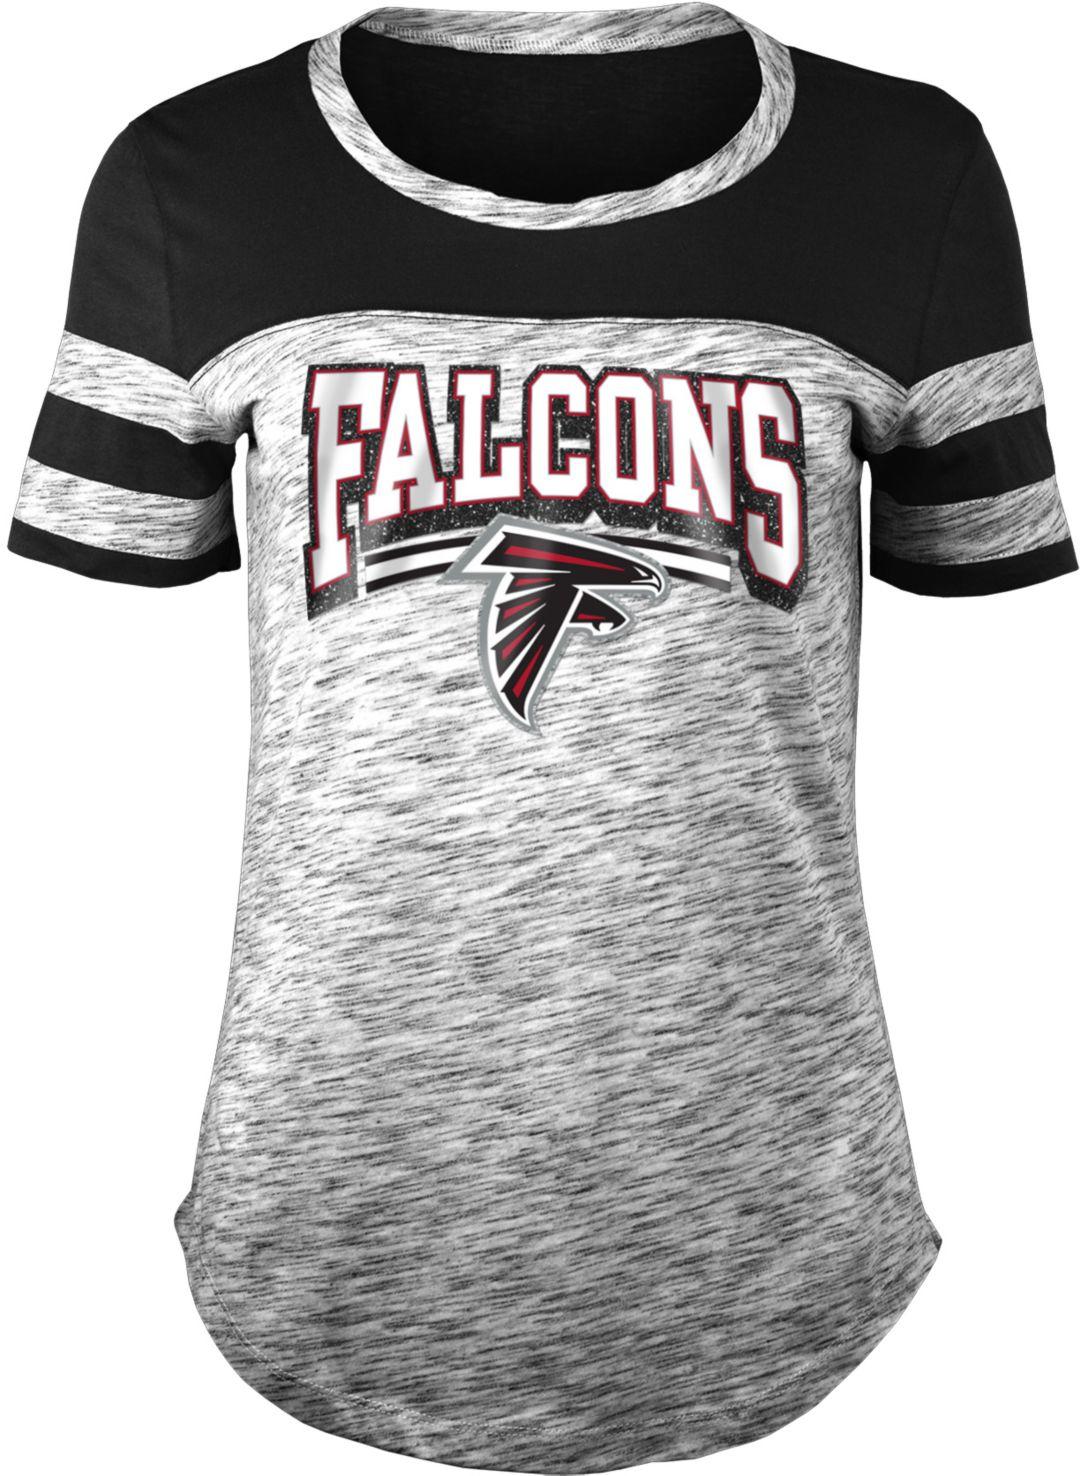 huge selection of 5f114 b9df9 NFL Team Apparel Women's Atlanta Falcons Space Dye Glitter Black T-Shirt